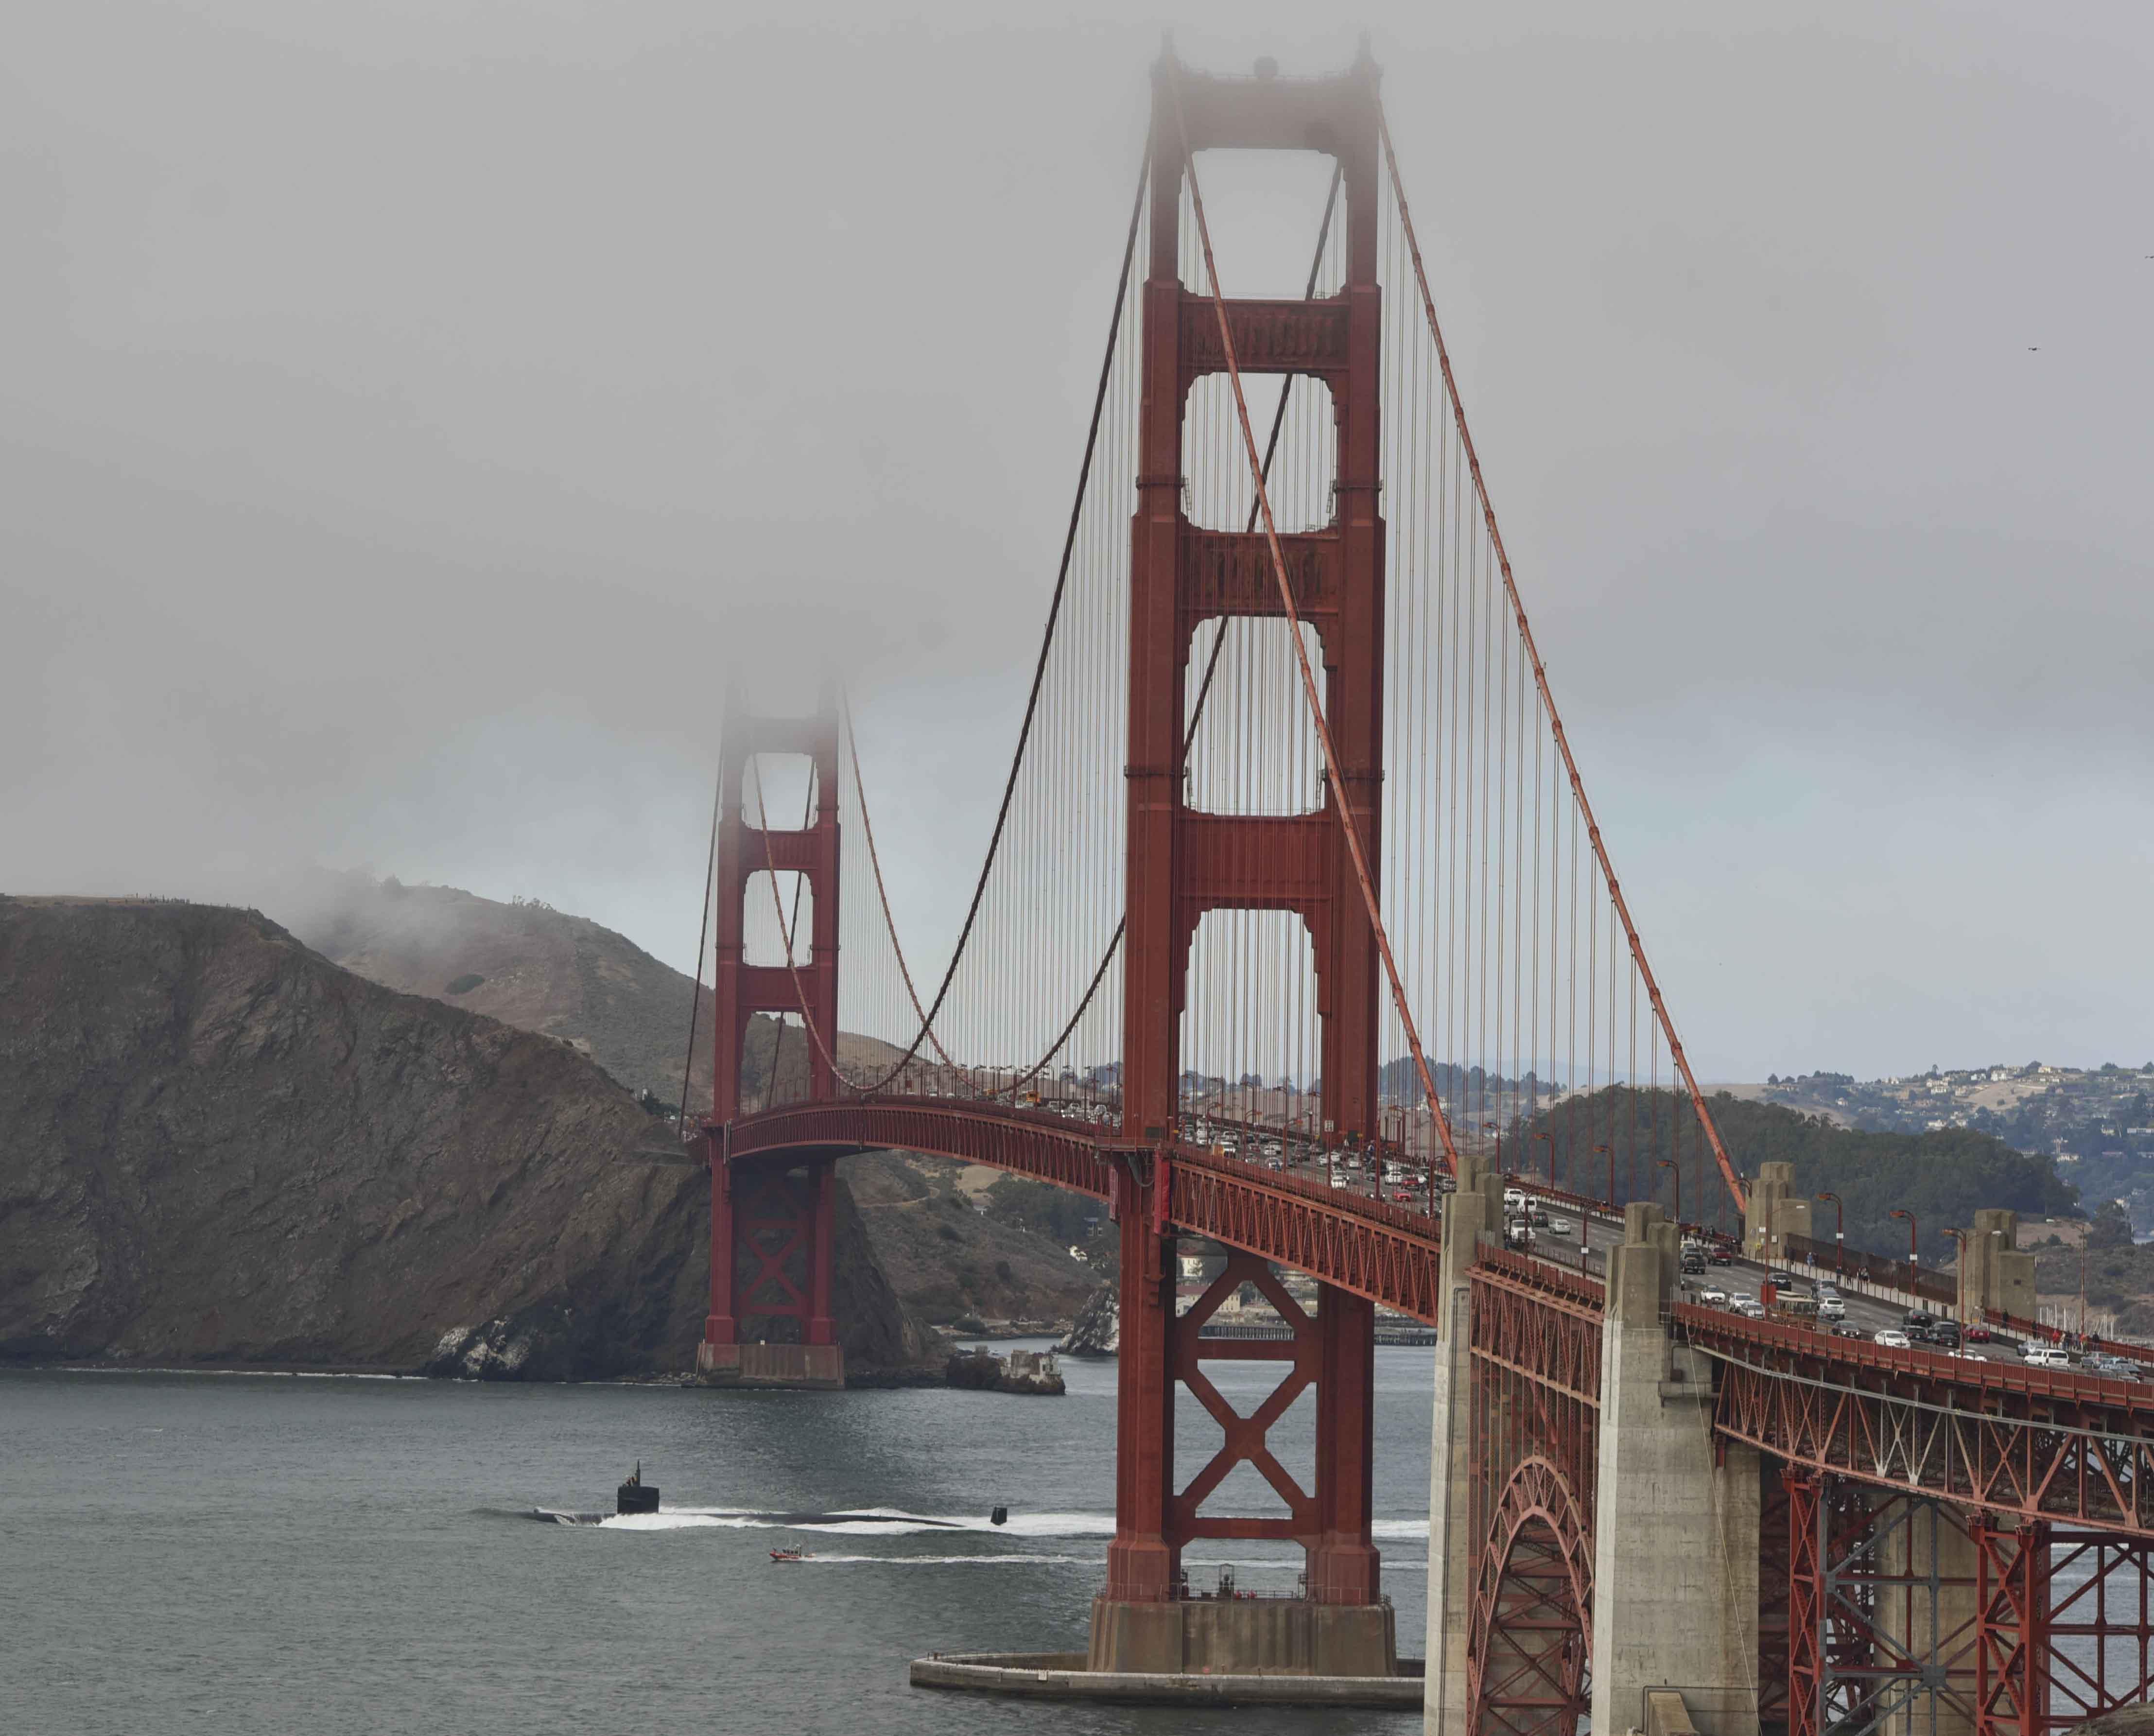 USS SAN FRANCISCO SSN-711 Auslaufen San Francisco am 12.10.2016 Bild: U.S. Navy